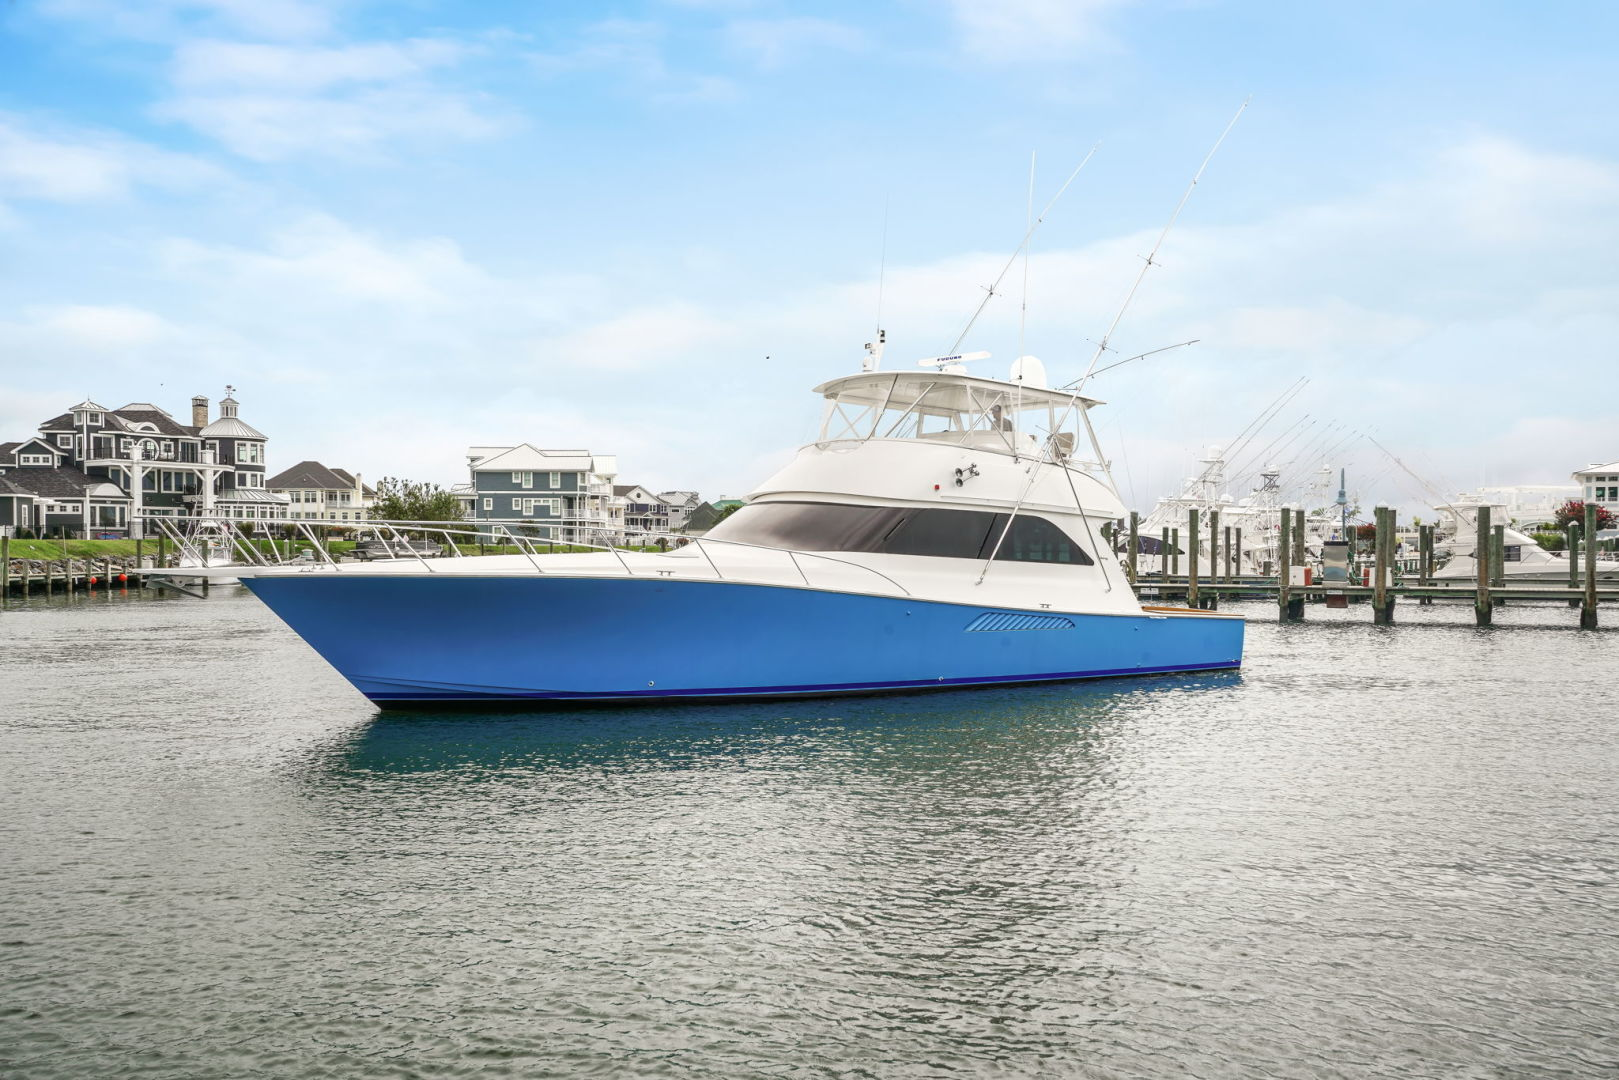 Viking-Convertible 2002-Blue Eyes North Palm Beach-Florida-United States-Blue Eyes-1490423   Thumbnail